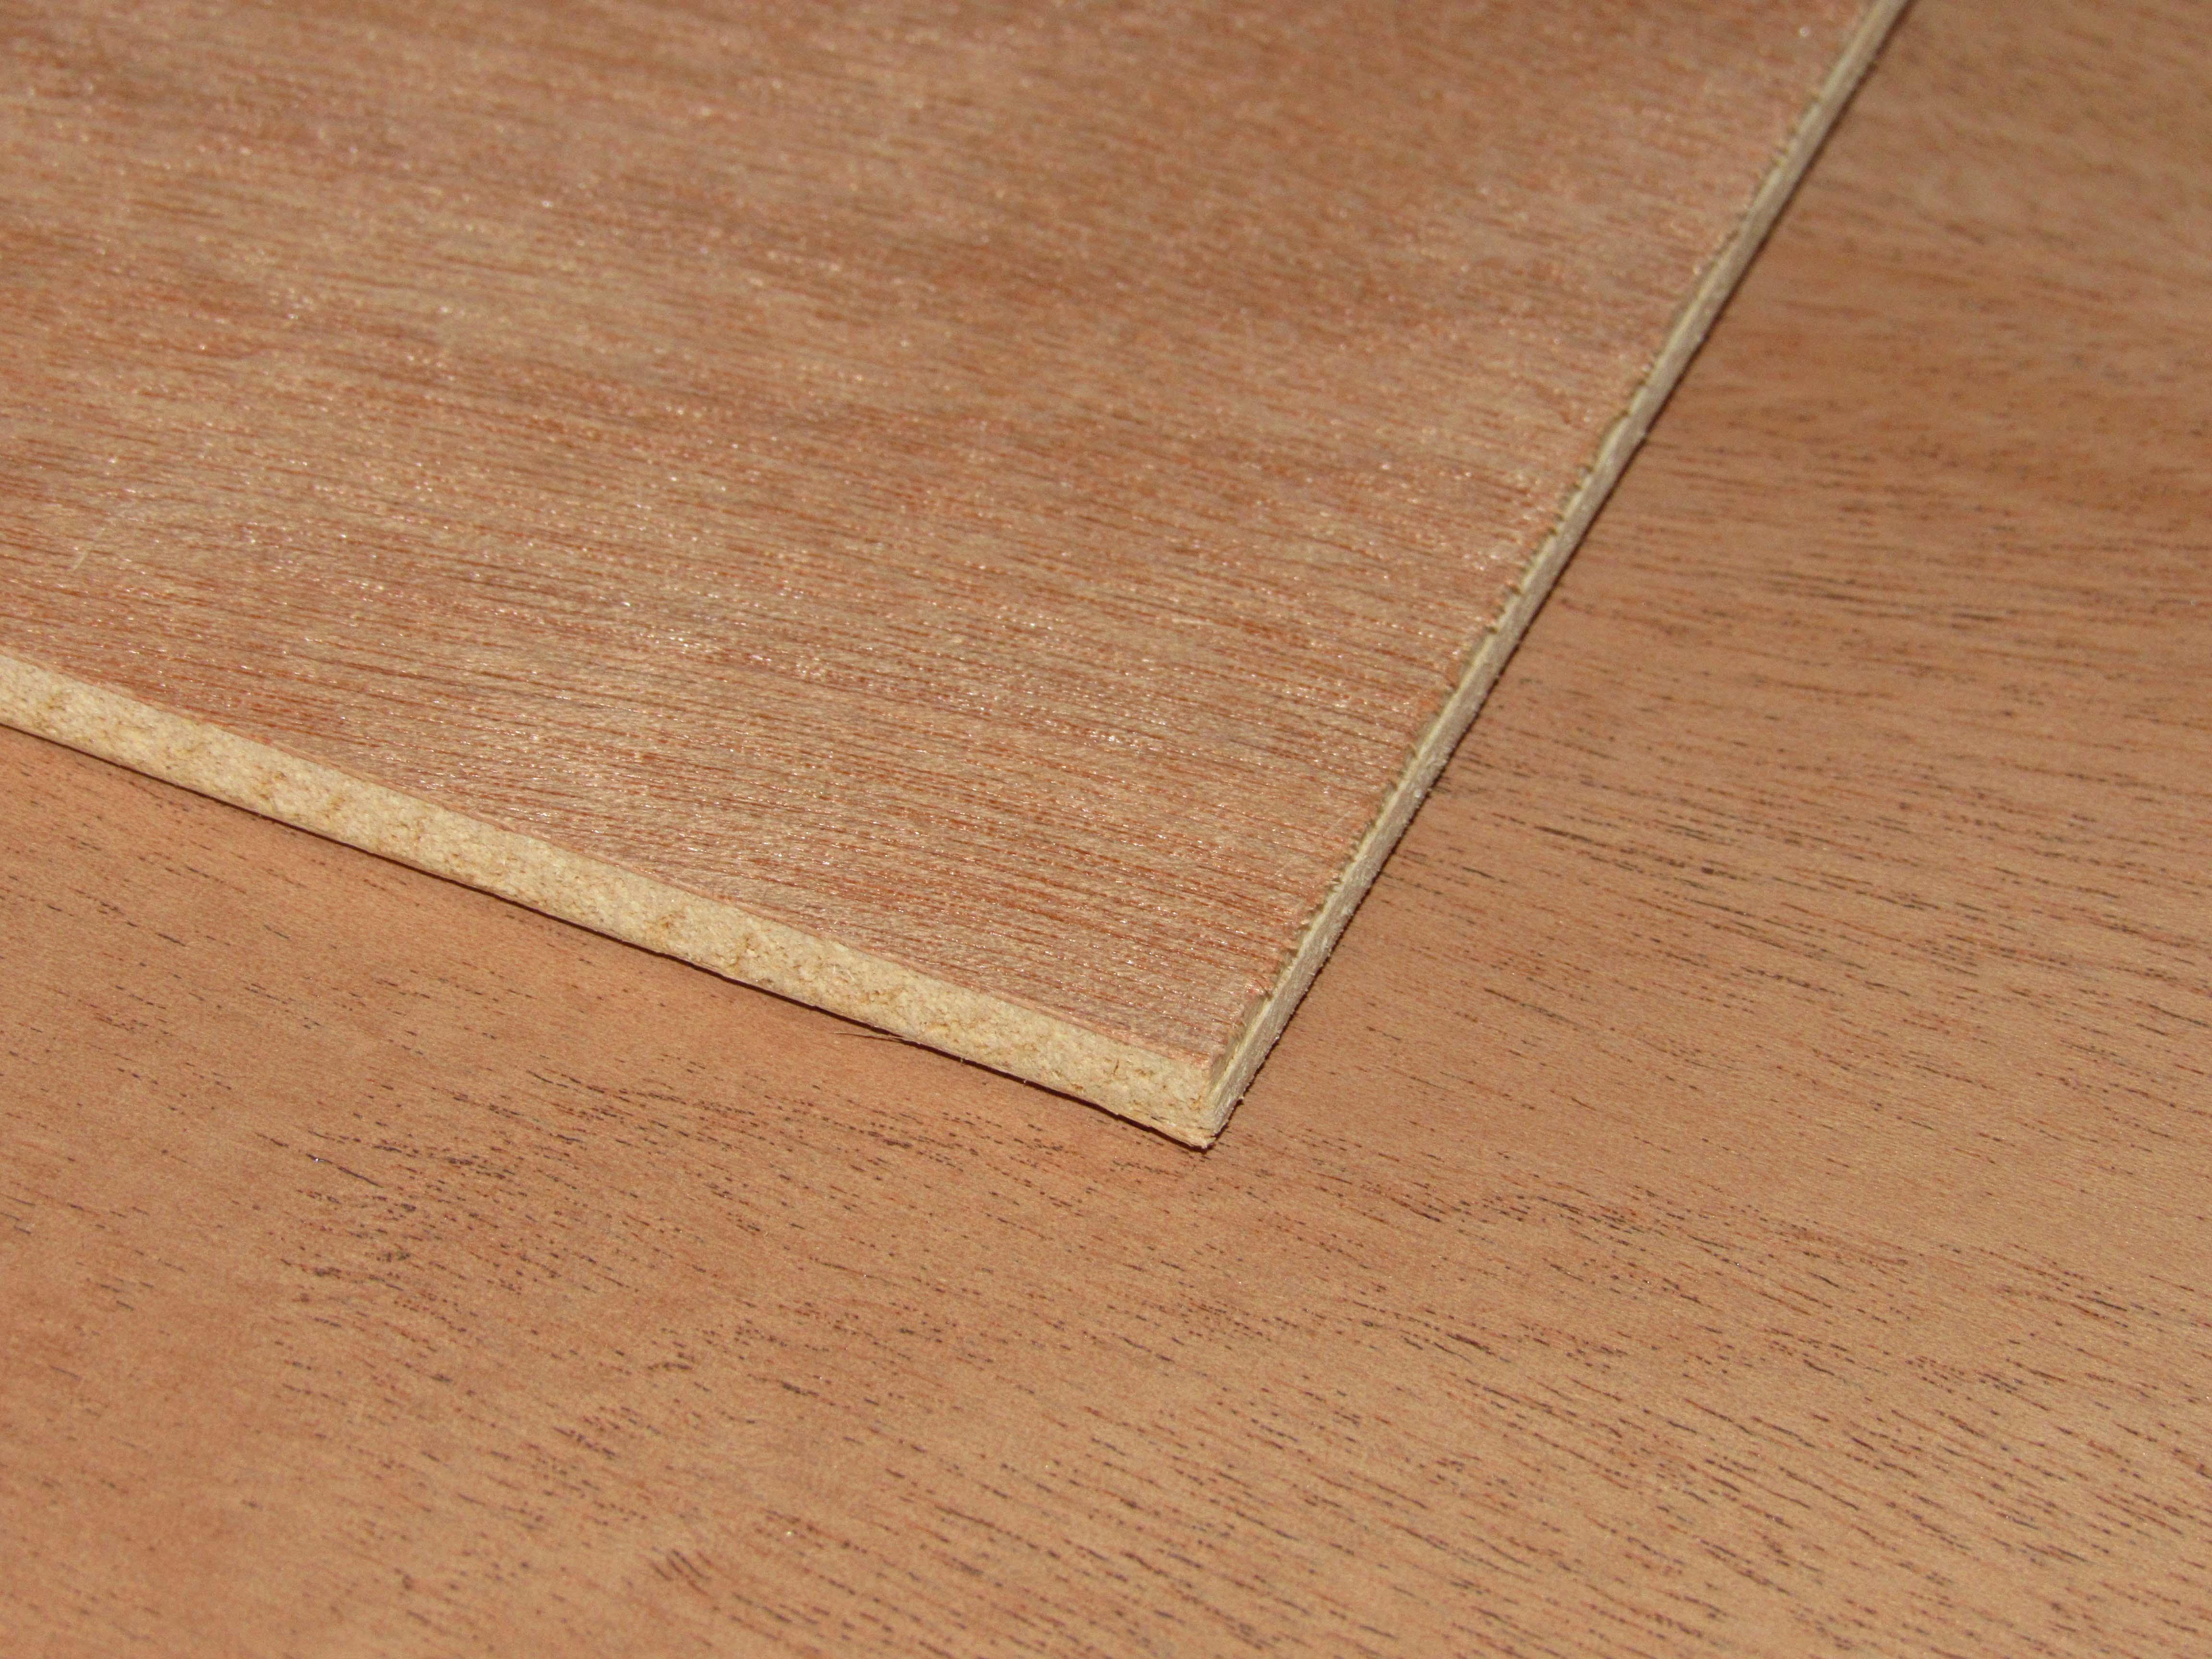 Luan Flooring